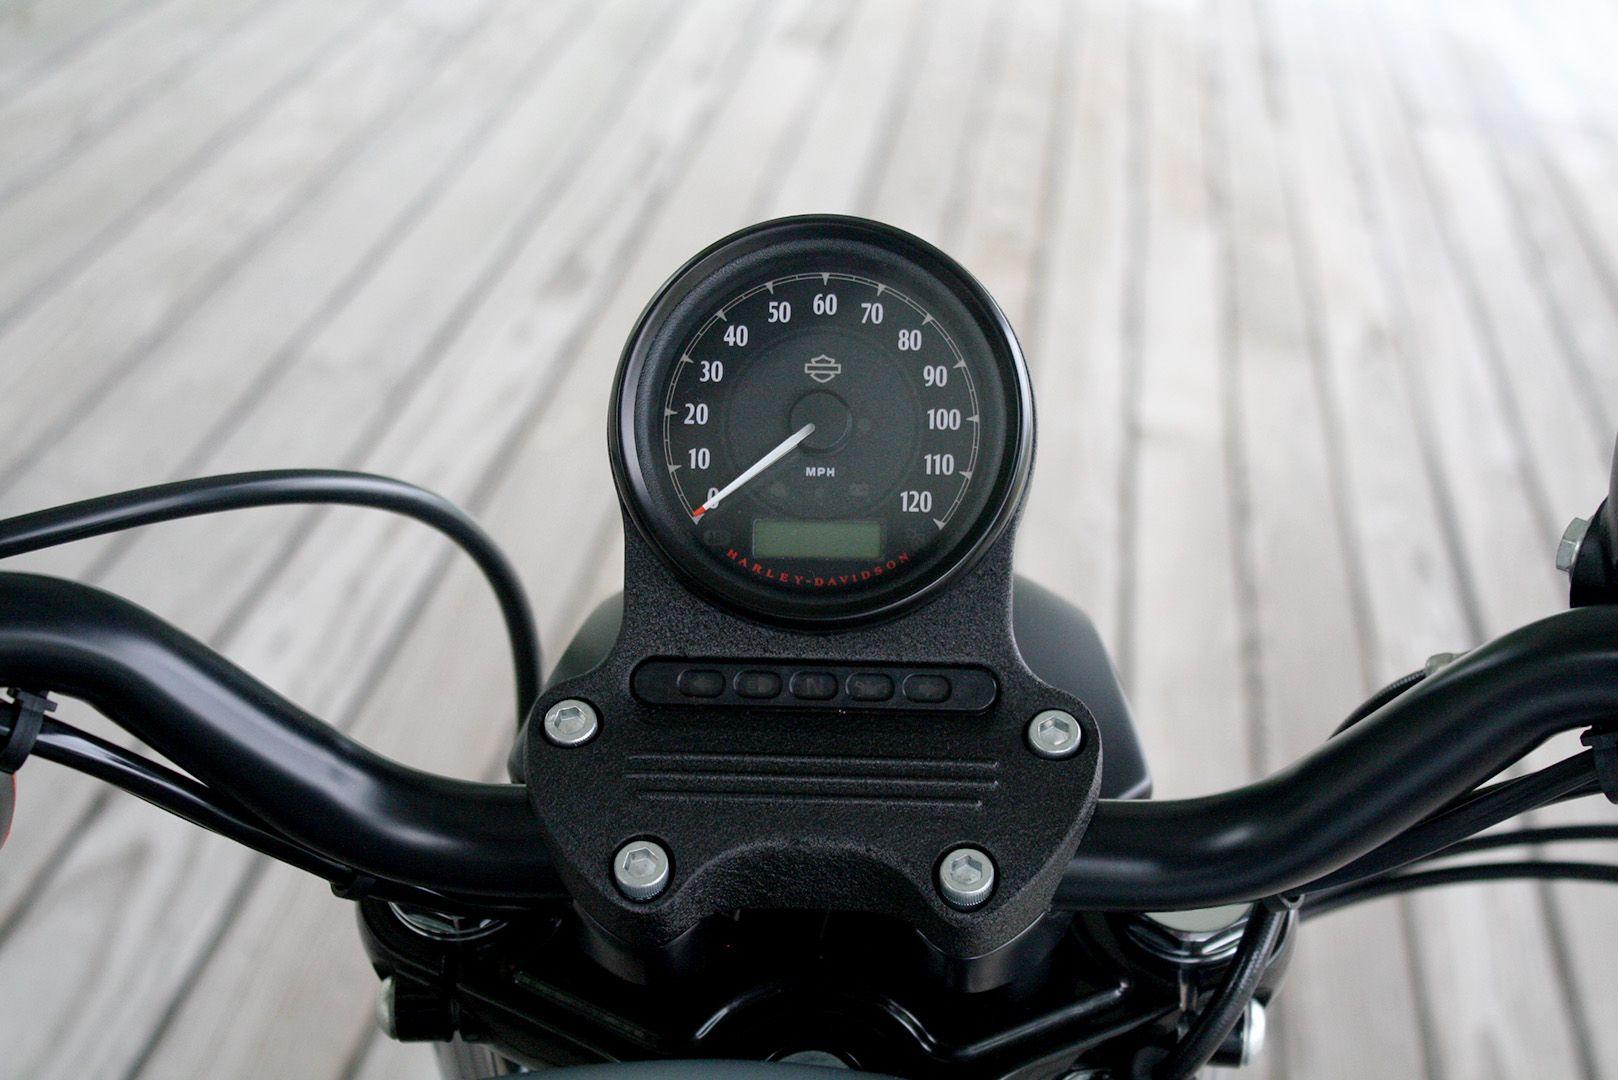 New 2020 Harley-Davidson Iron 883